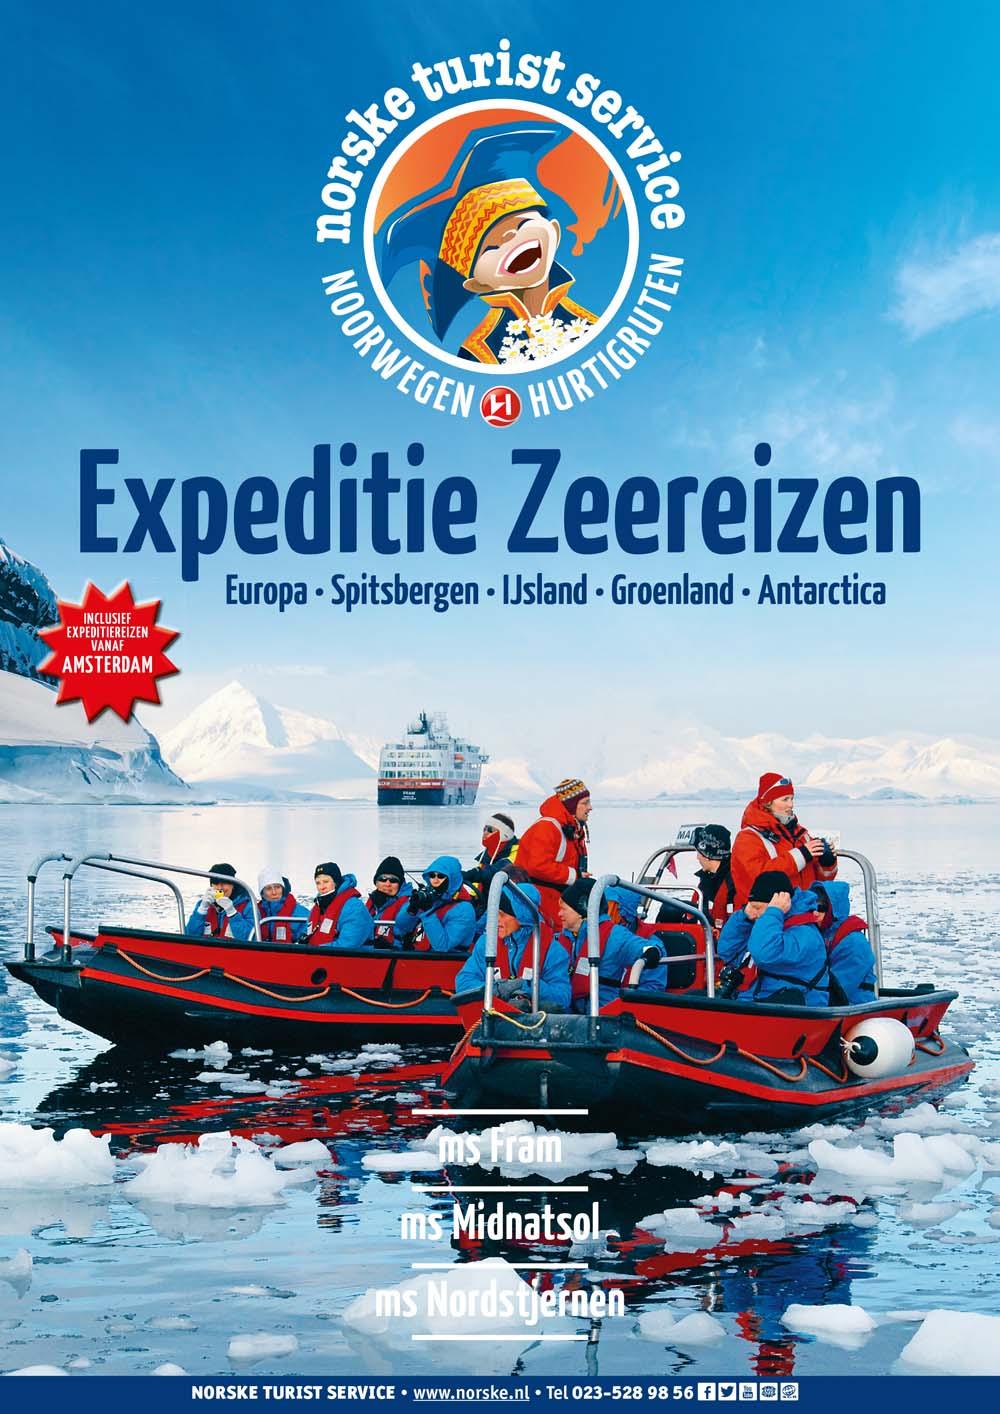 Hurtigruten Expeditie-Zeereizen 2016-2017